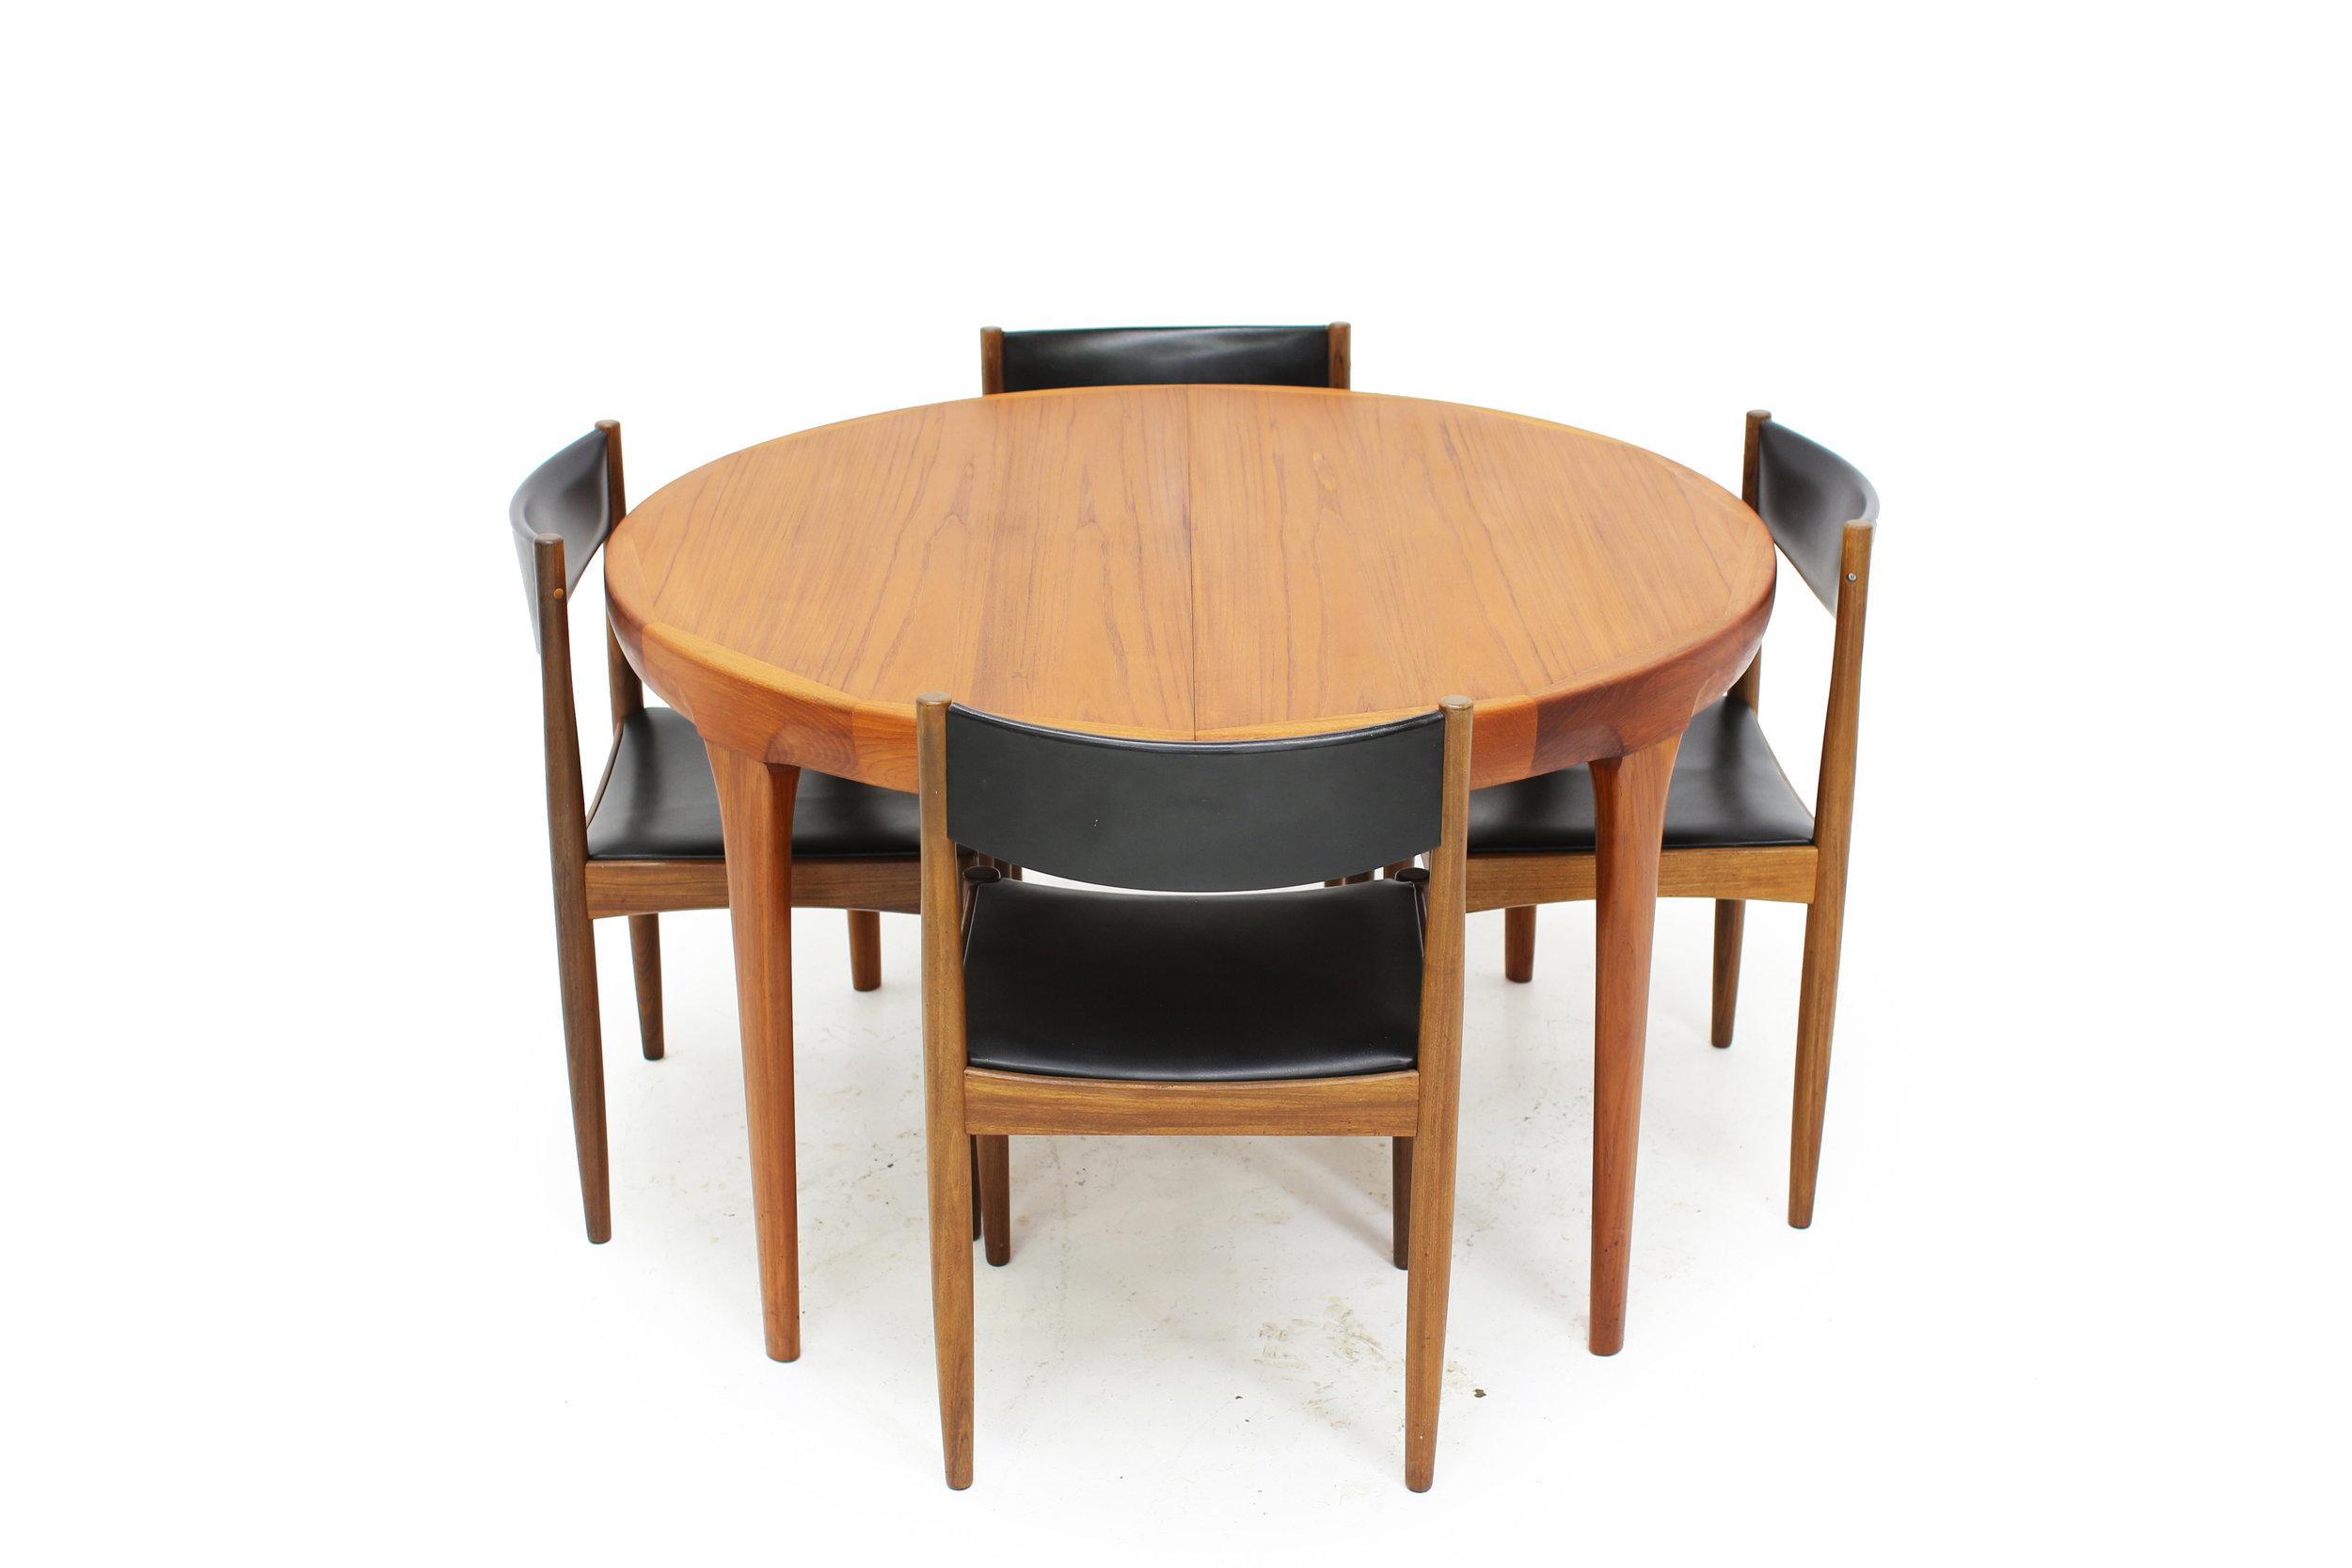 mid-century-teak-dining-table-ib-kofod-larsen-round-chairs.jpg